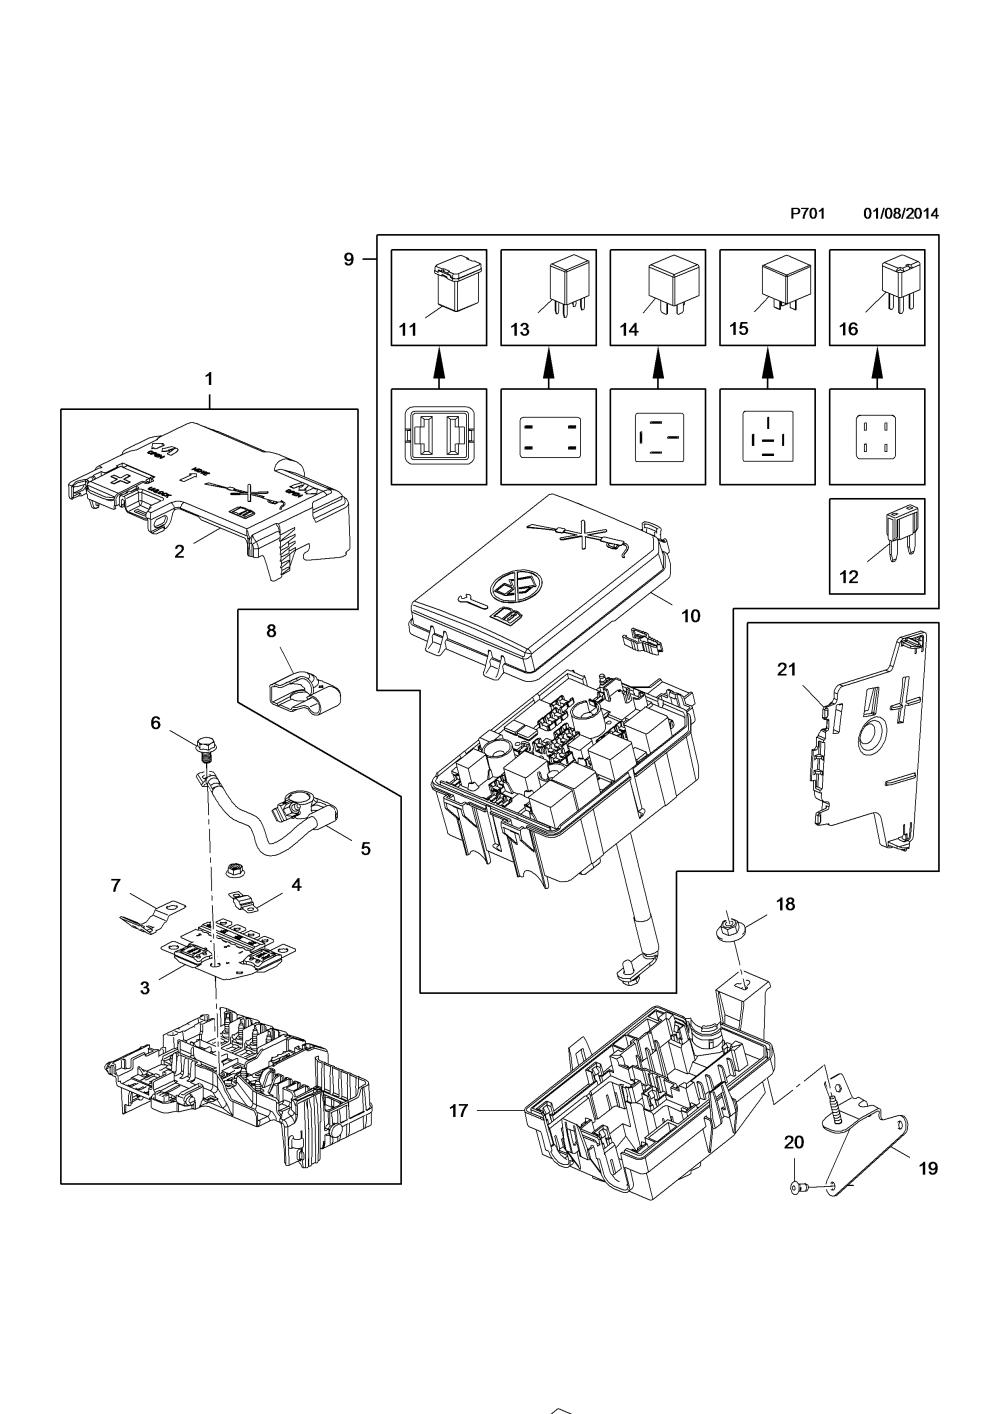 medium resolution of epc fuse box another blog about wiring diagram u2022 rh twosoutherndivas co